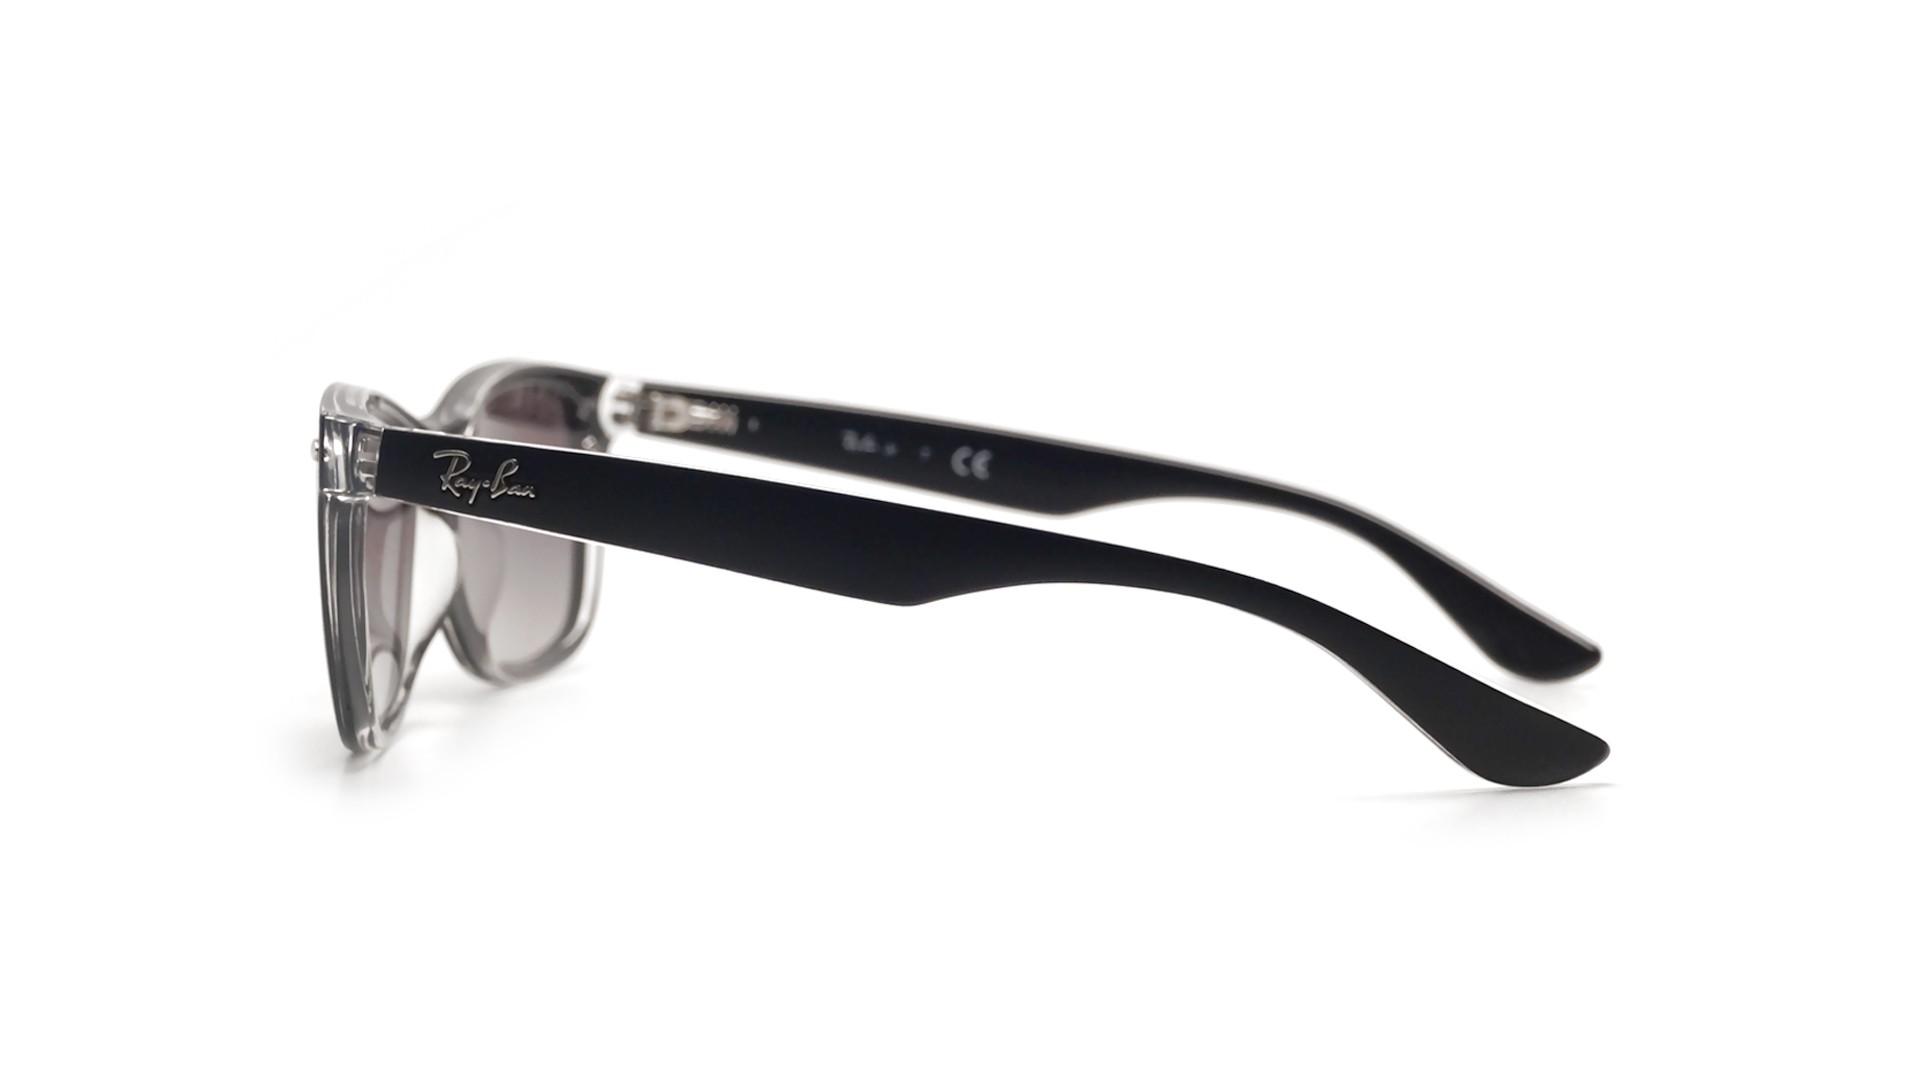 Sunglasses Ray-Ban Wayfarer Black Matte RJ9052S 7022 11 48-16 Junior  Gradient fbcab7b57447